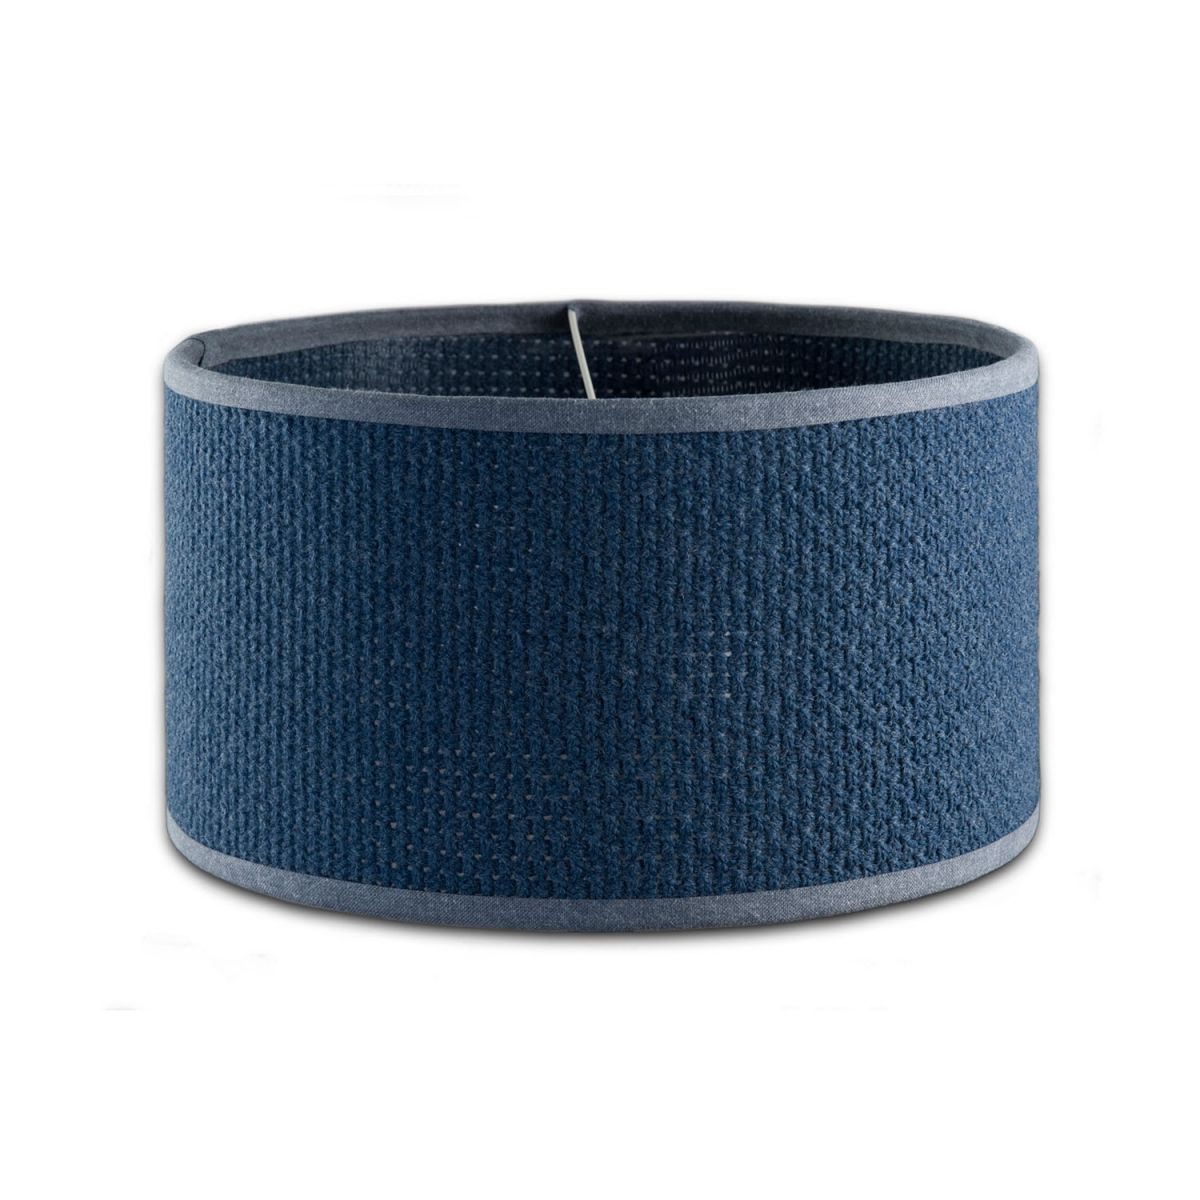 knit factory 1111613 lampkap 35 barley jeans